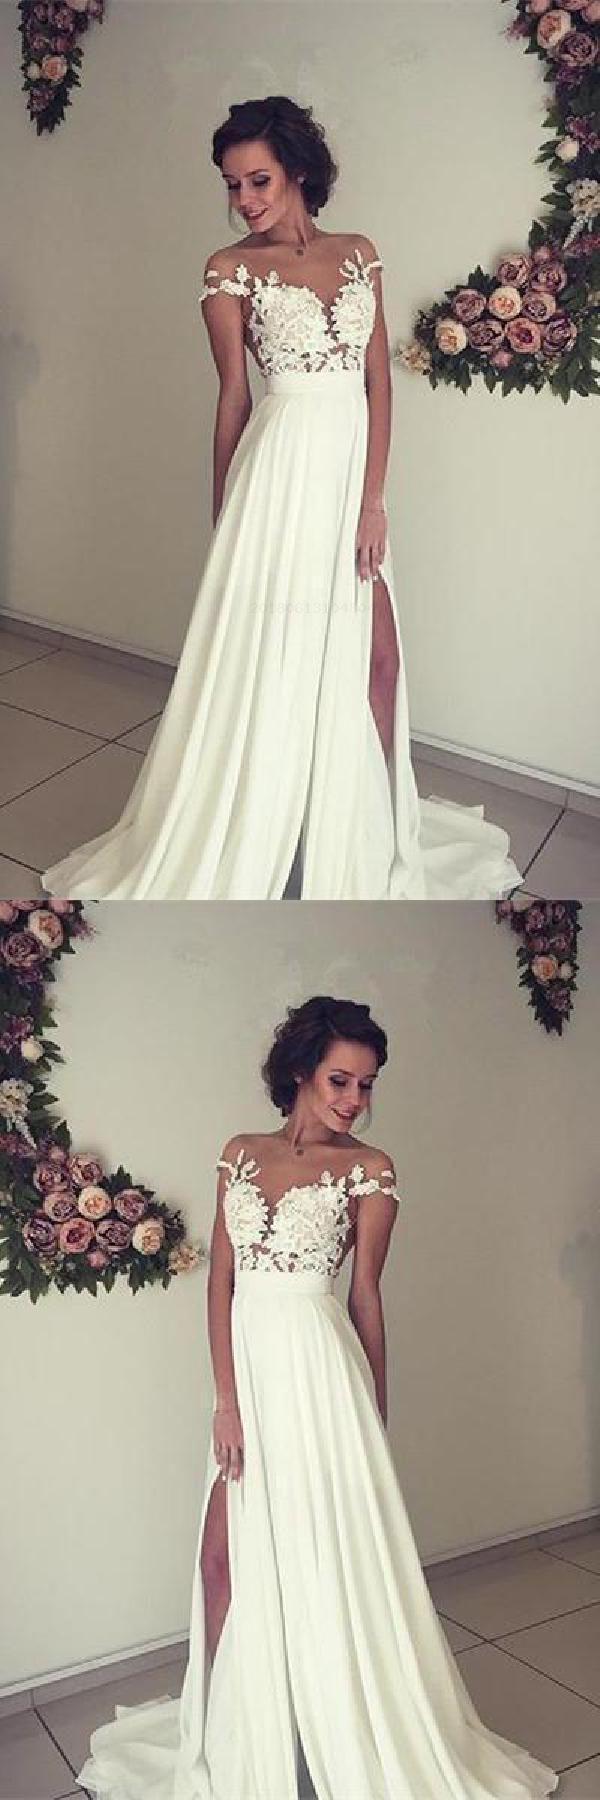 Simple Wedding Dresses Custom Wedding Dresses Wedding Dresses Chiffon Ivory Weddin Short Sleeve Wedding Dress Simple Lace Wedding Dress Wedding Dresses 2018 [ 1800 x 600 Pixel ]